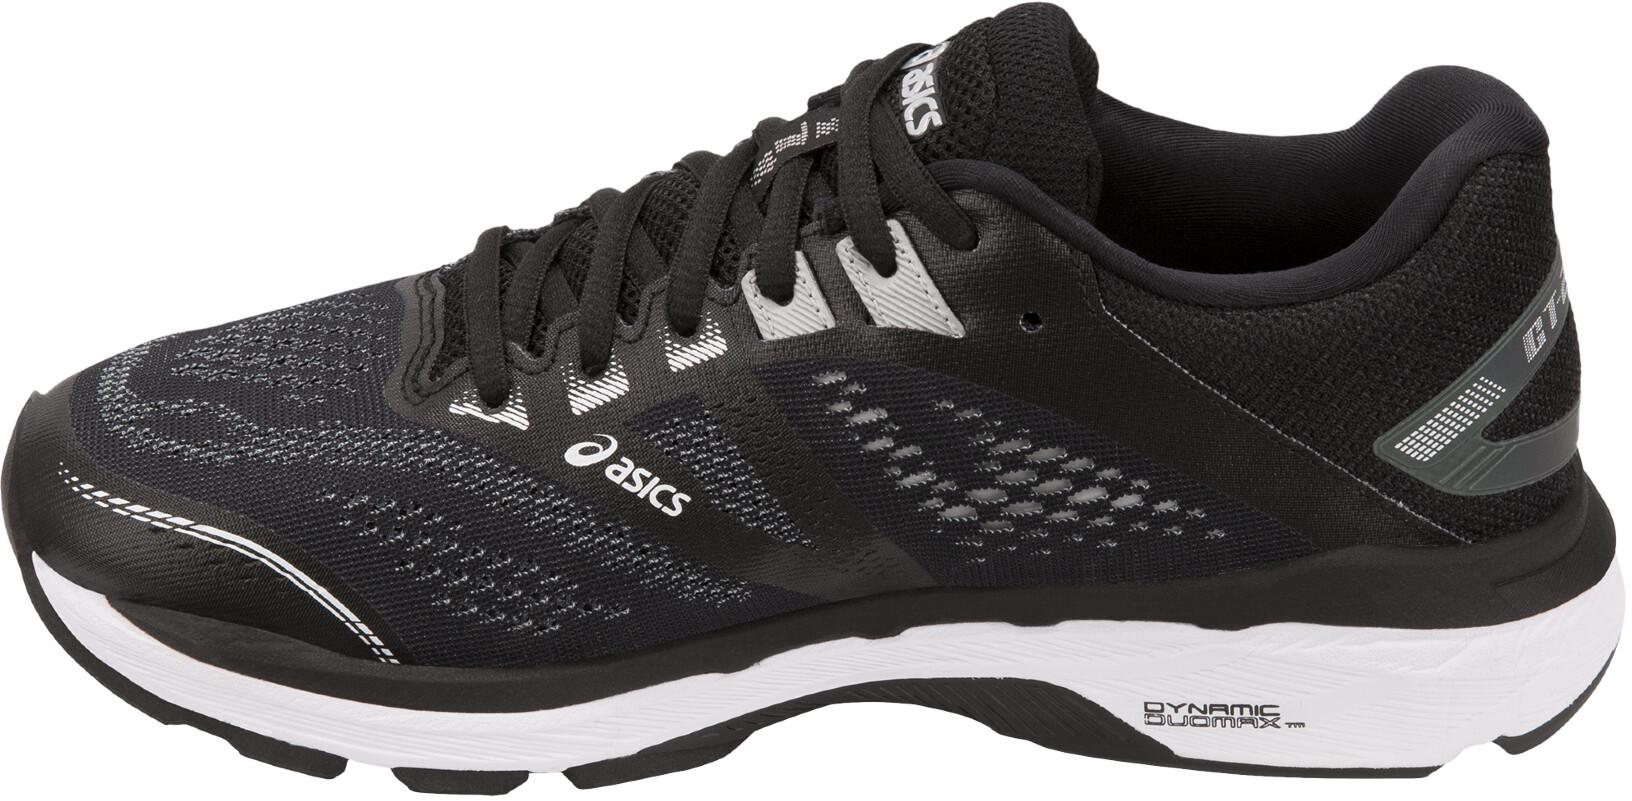 scarpe da ginnastica asics running gt 2000 7